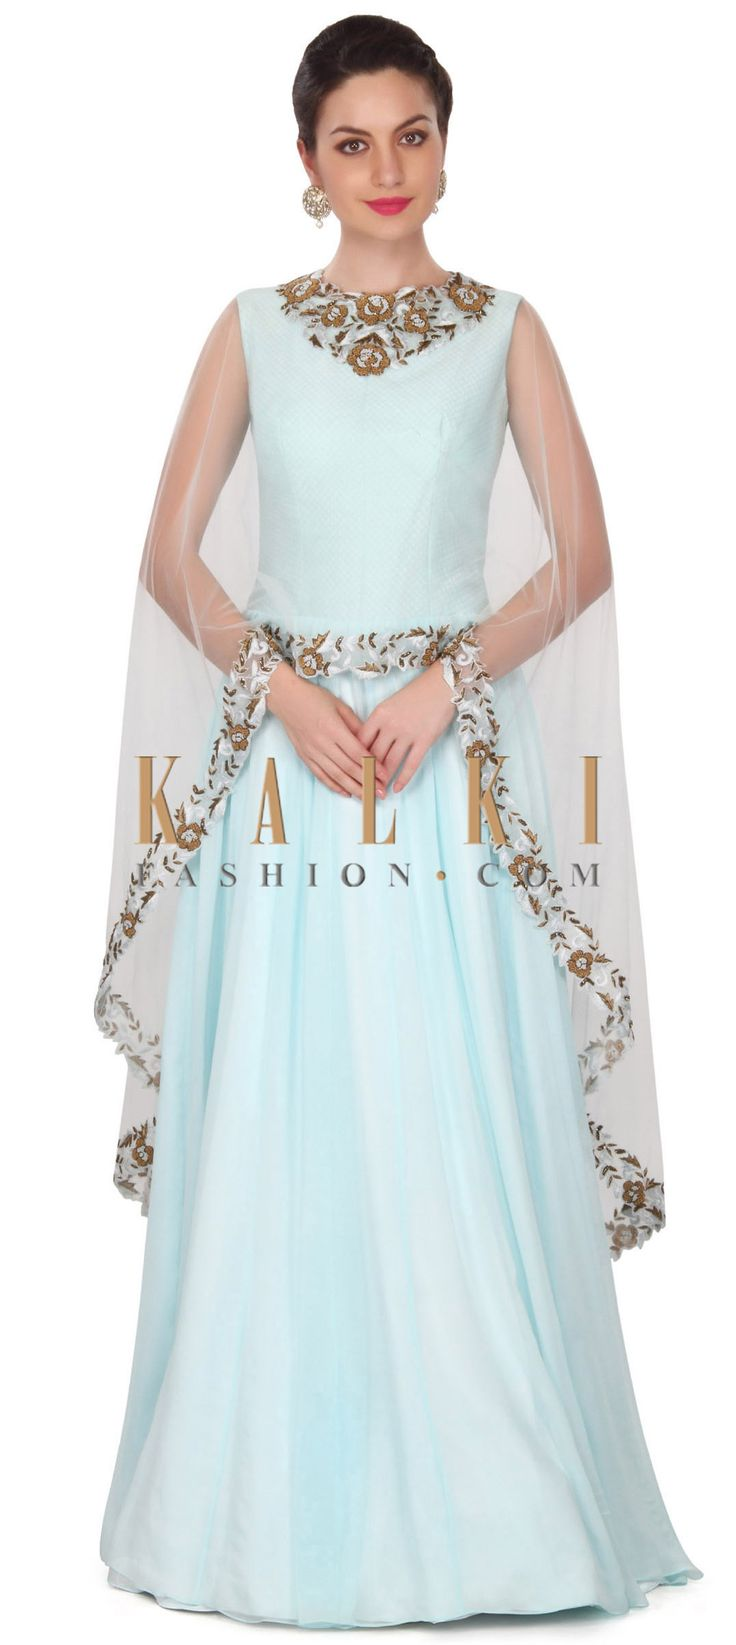 best moncher abiye dress images on pinterest ball gown classy